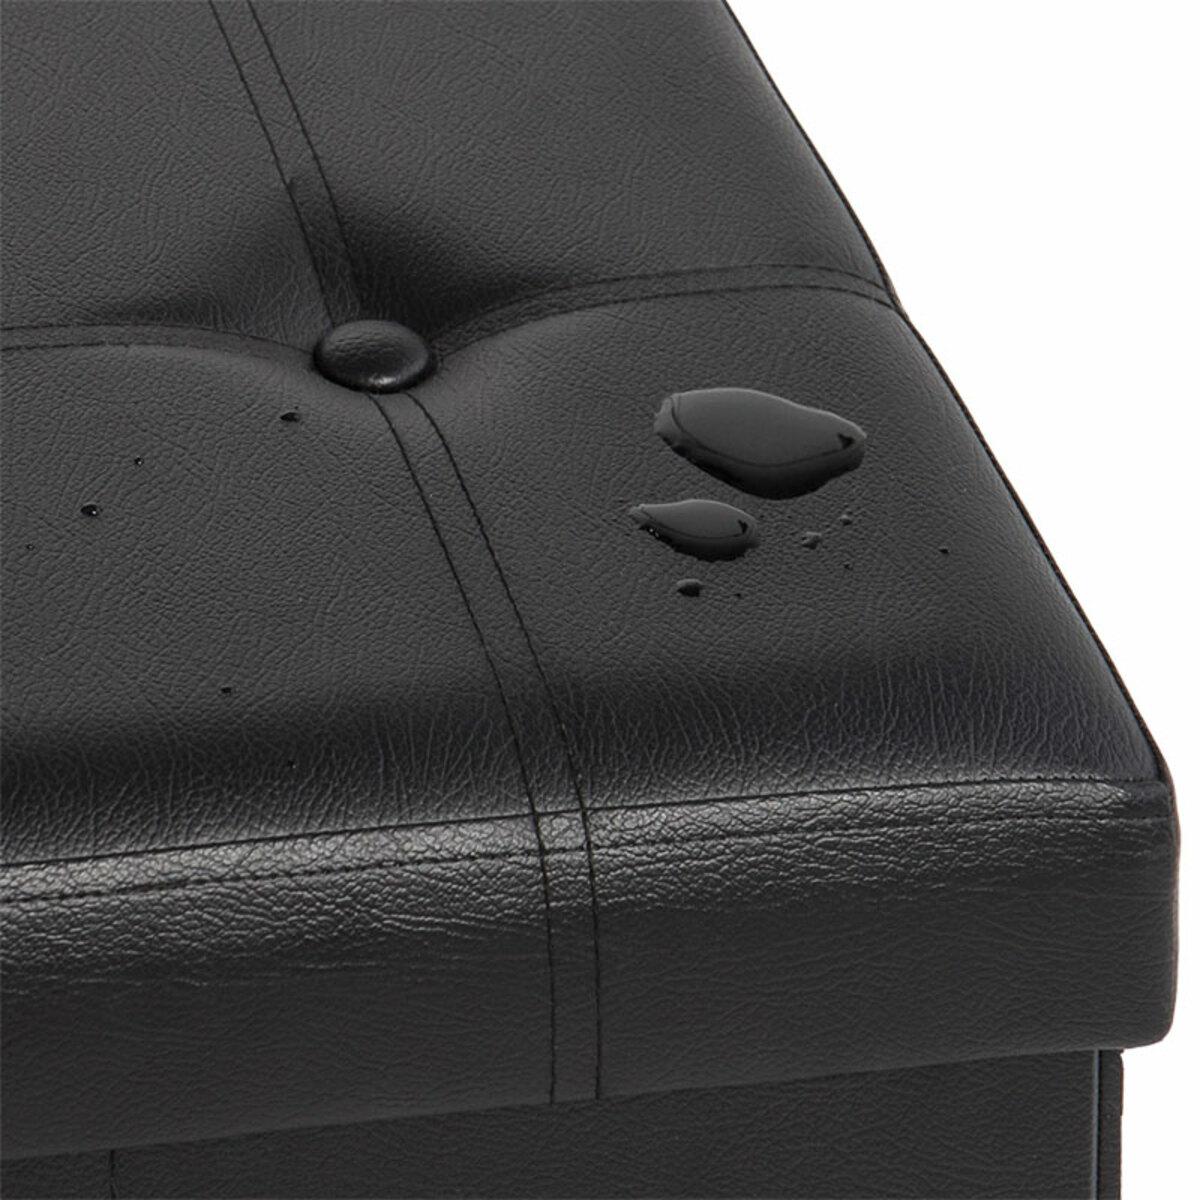 Bild 5 von Deuba Sitzbank/Sitztruhe schwarz